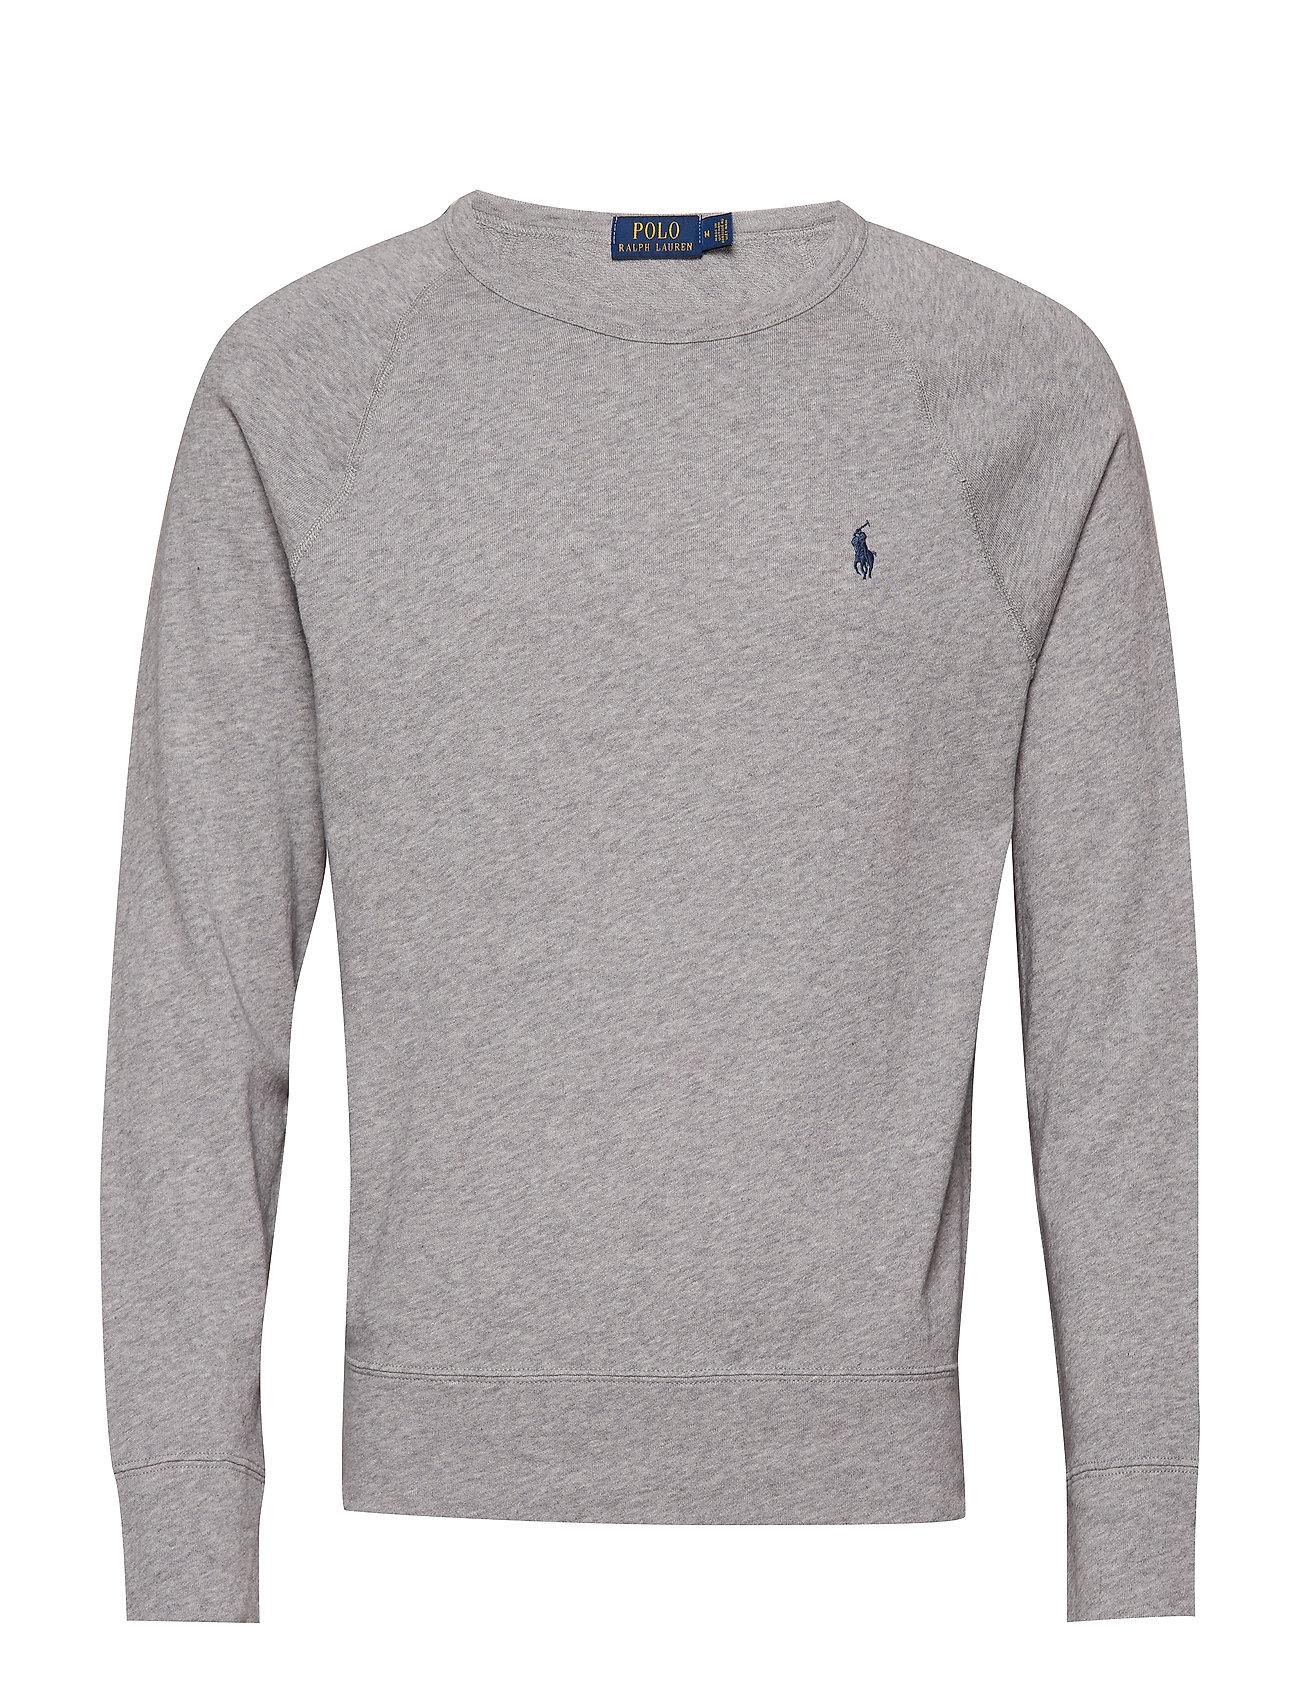 Polo Ralph Lauren Cotton Spa Terry Sweatshirt